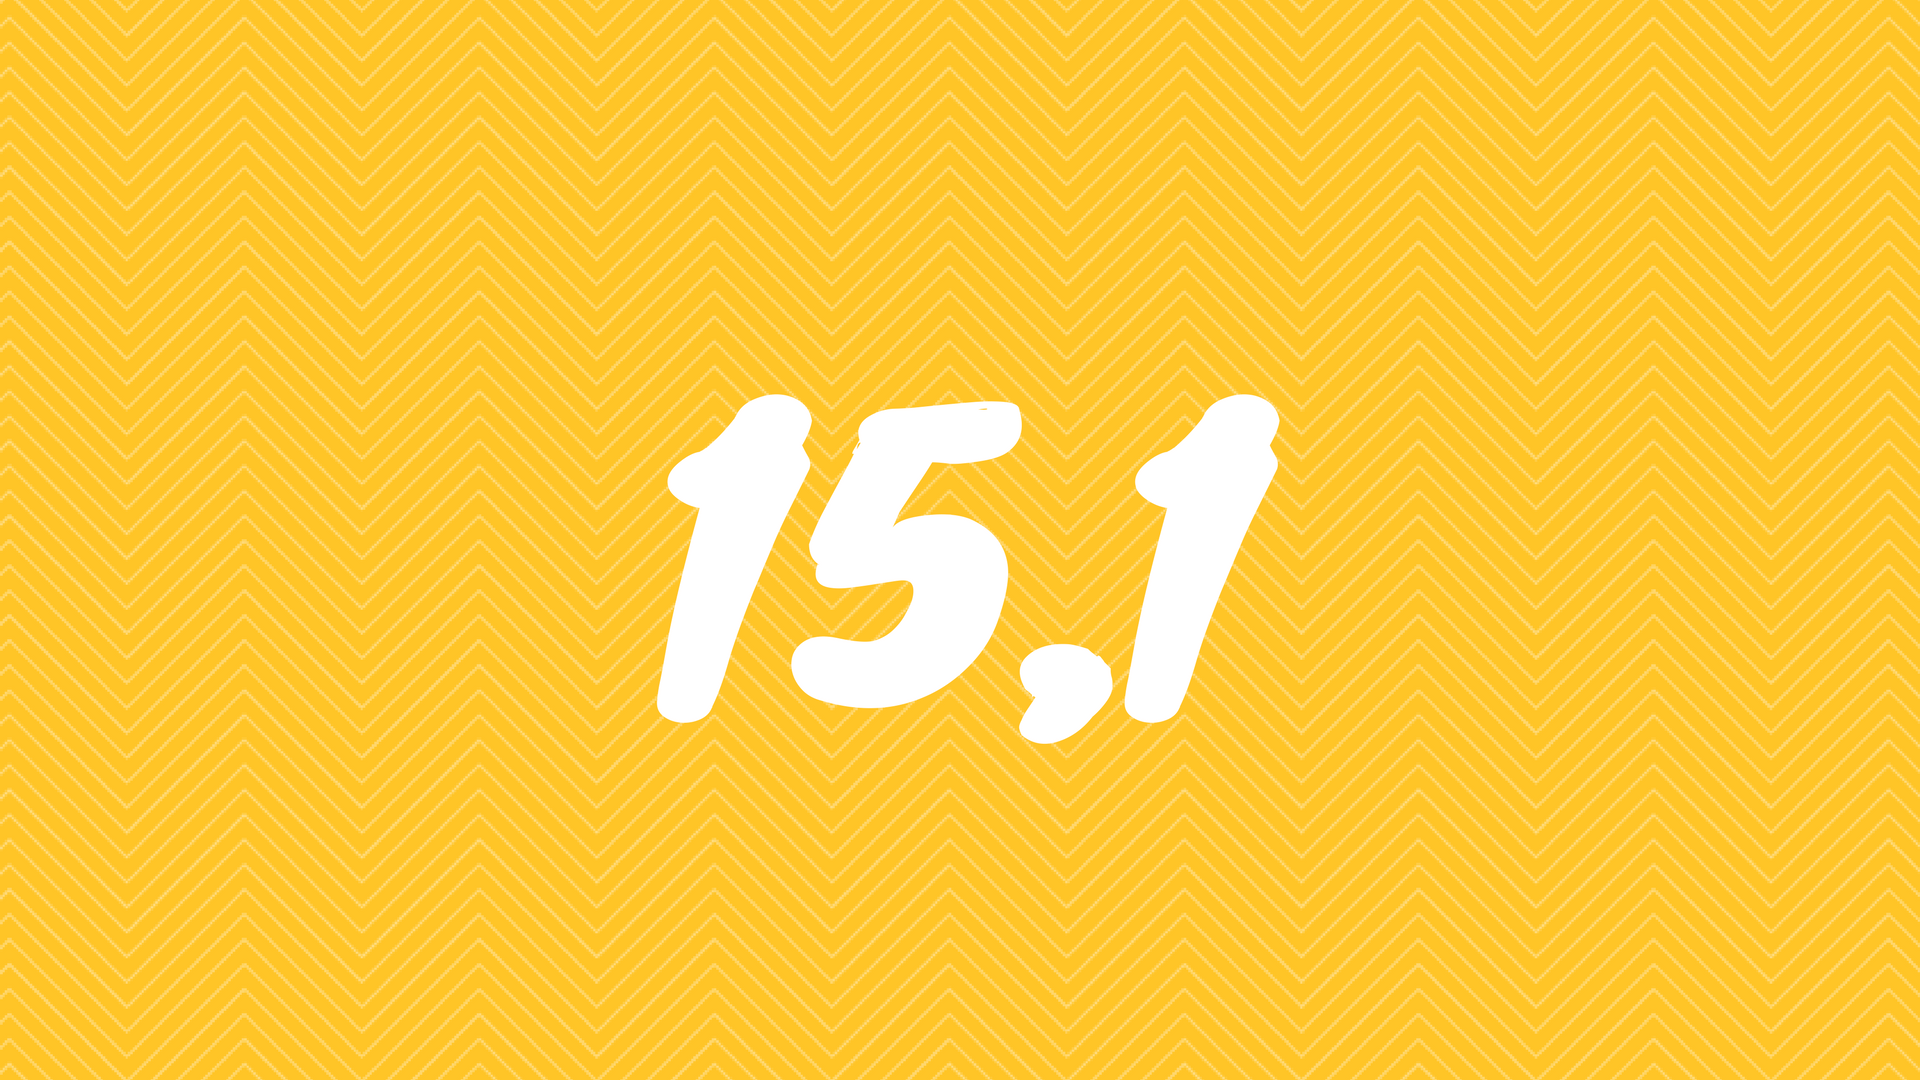 1920-x-1080-Le-chiffre-de-la-semaine-32